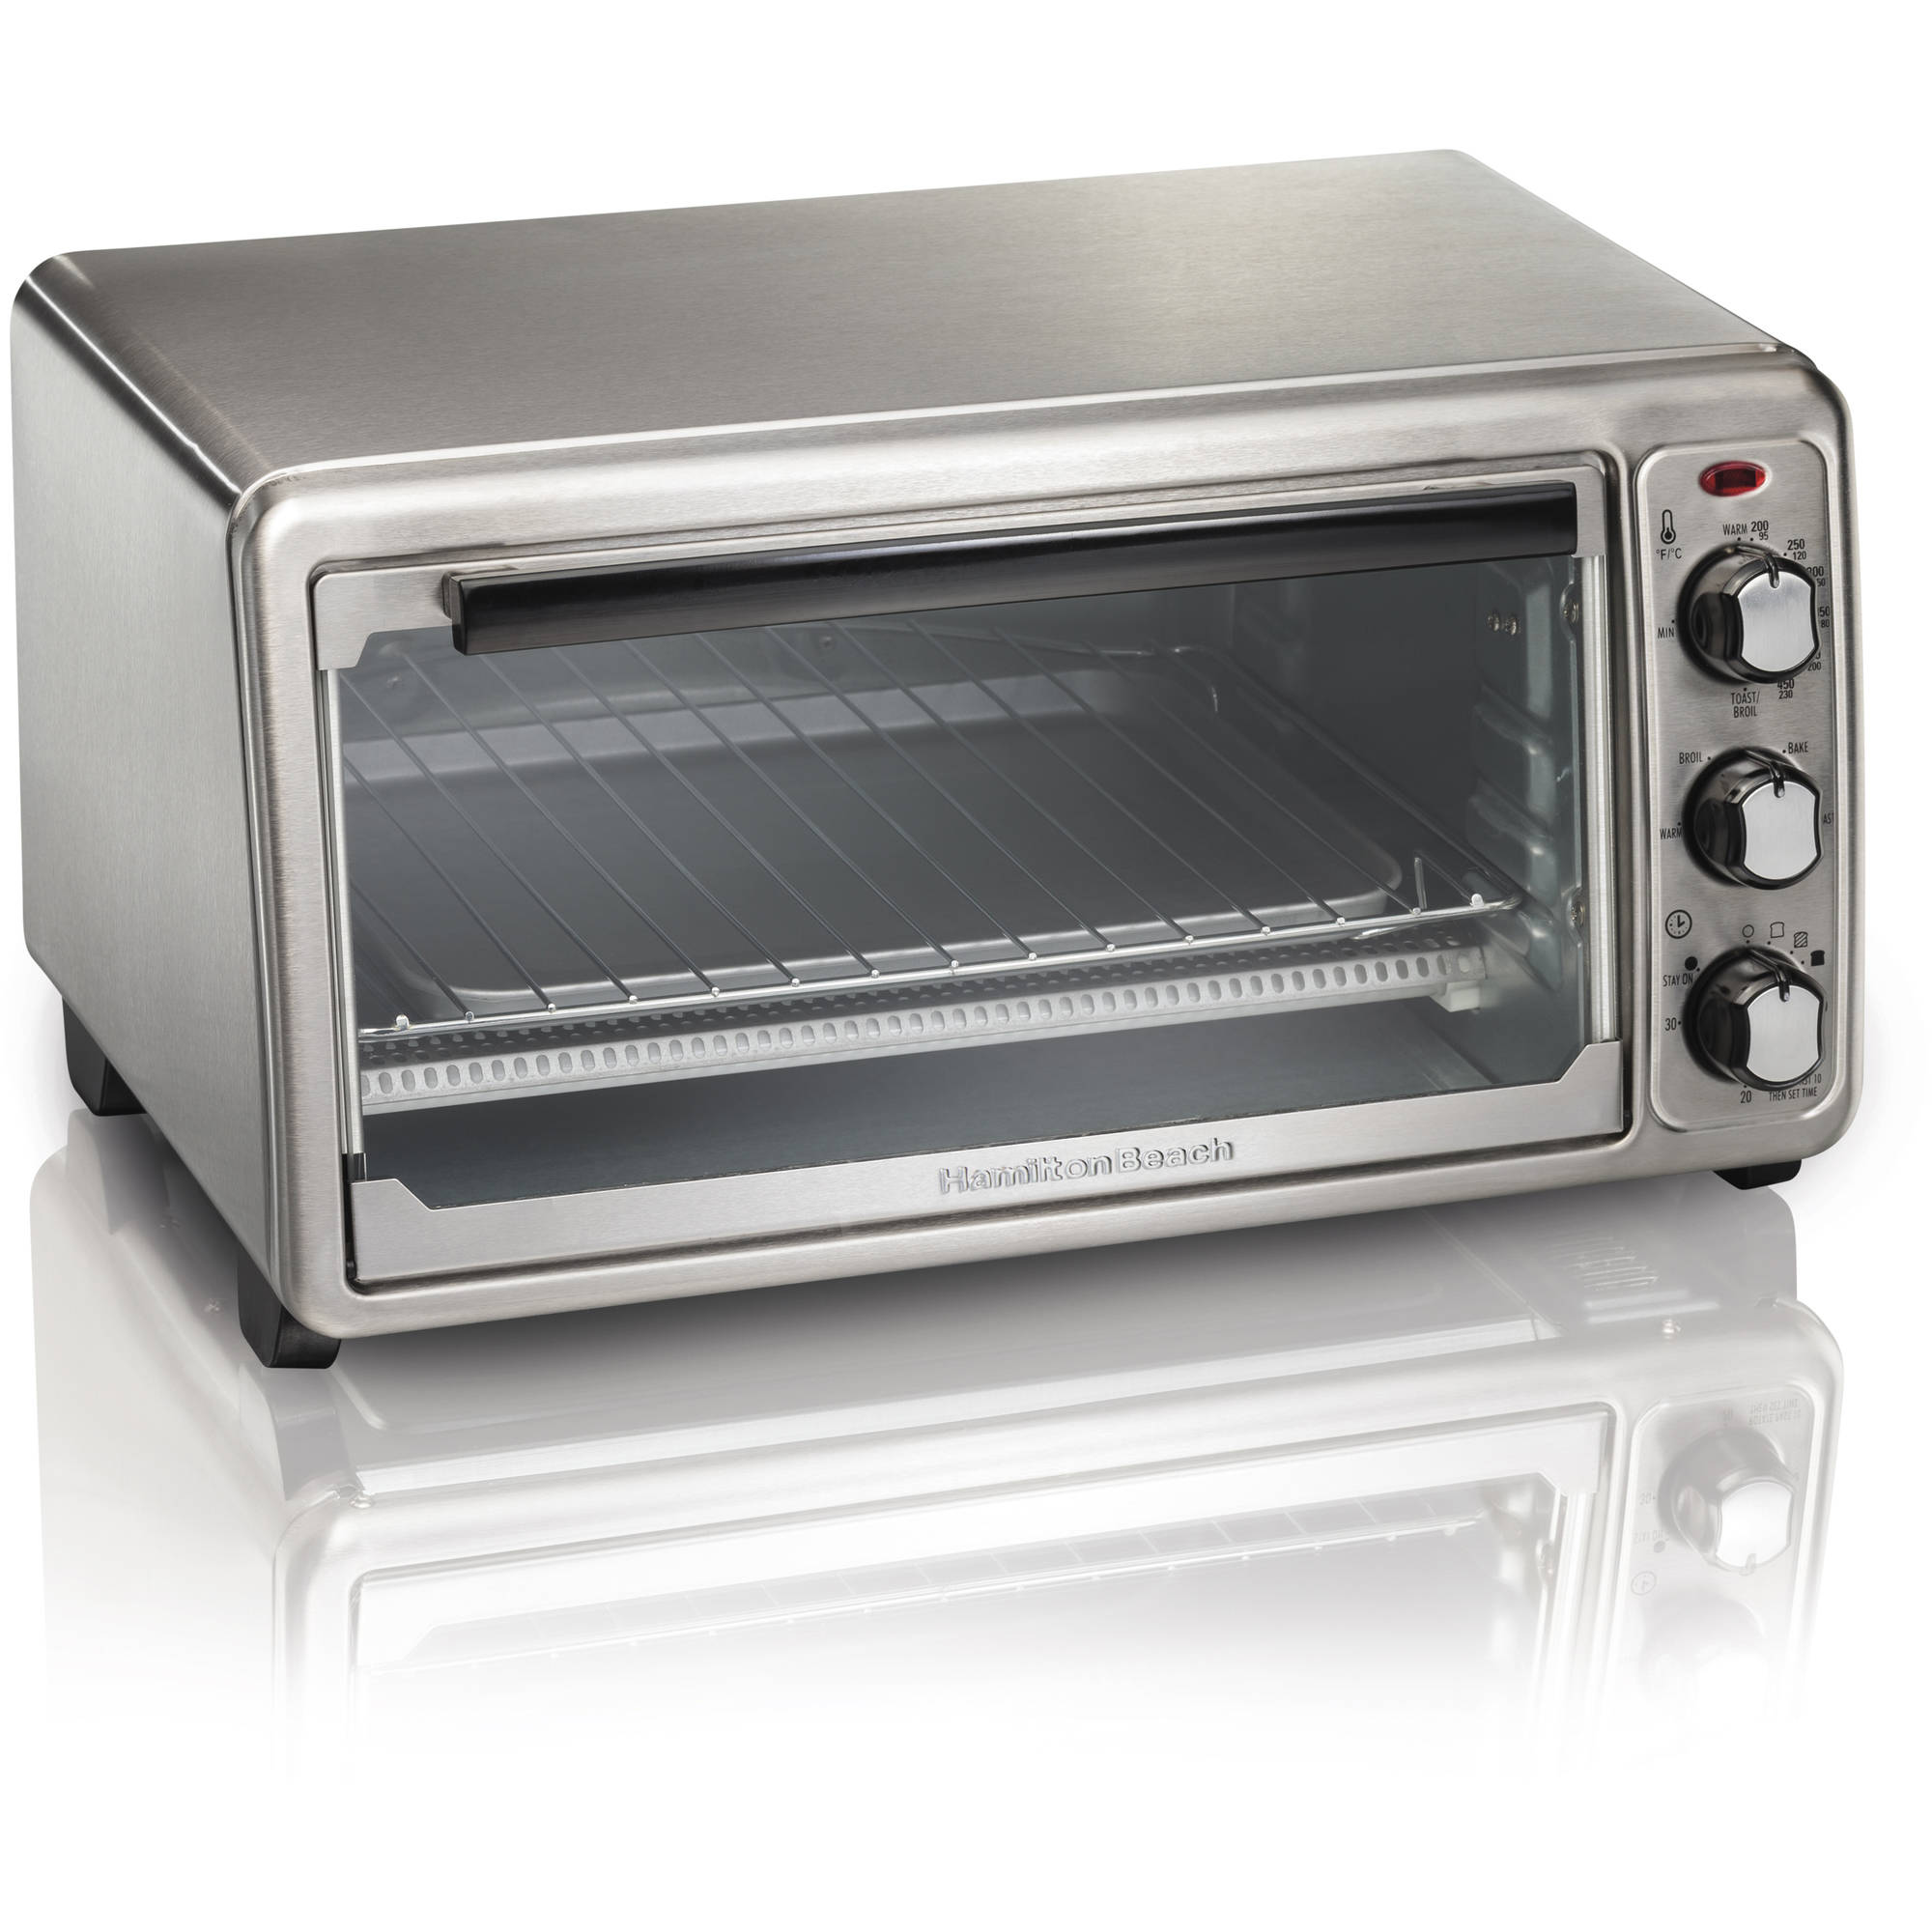 Hamilton Beach Toaster Oven | Model# 31411